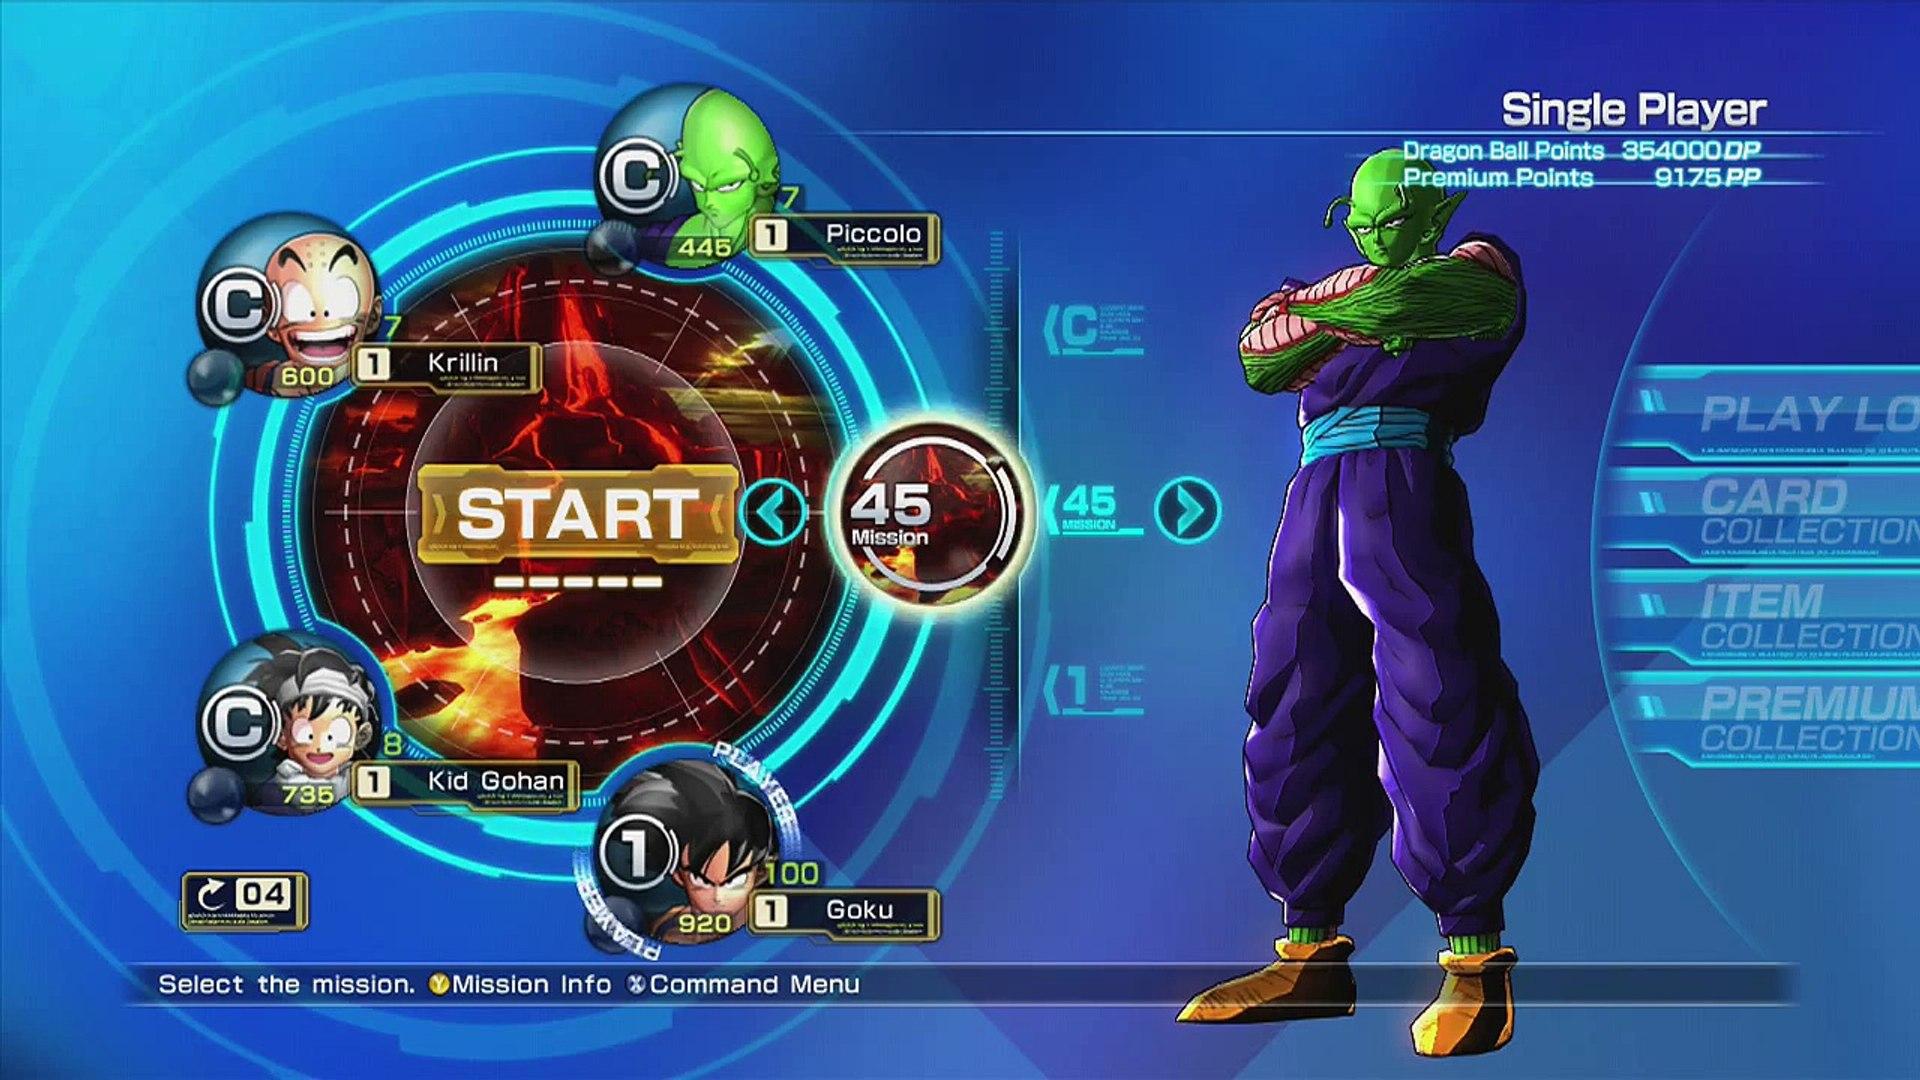 Dragon Ball Z Battle of Z Gameplay Walkthrough Part 14 | Android Saga |ドラゴンボールZ バトルのゼット